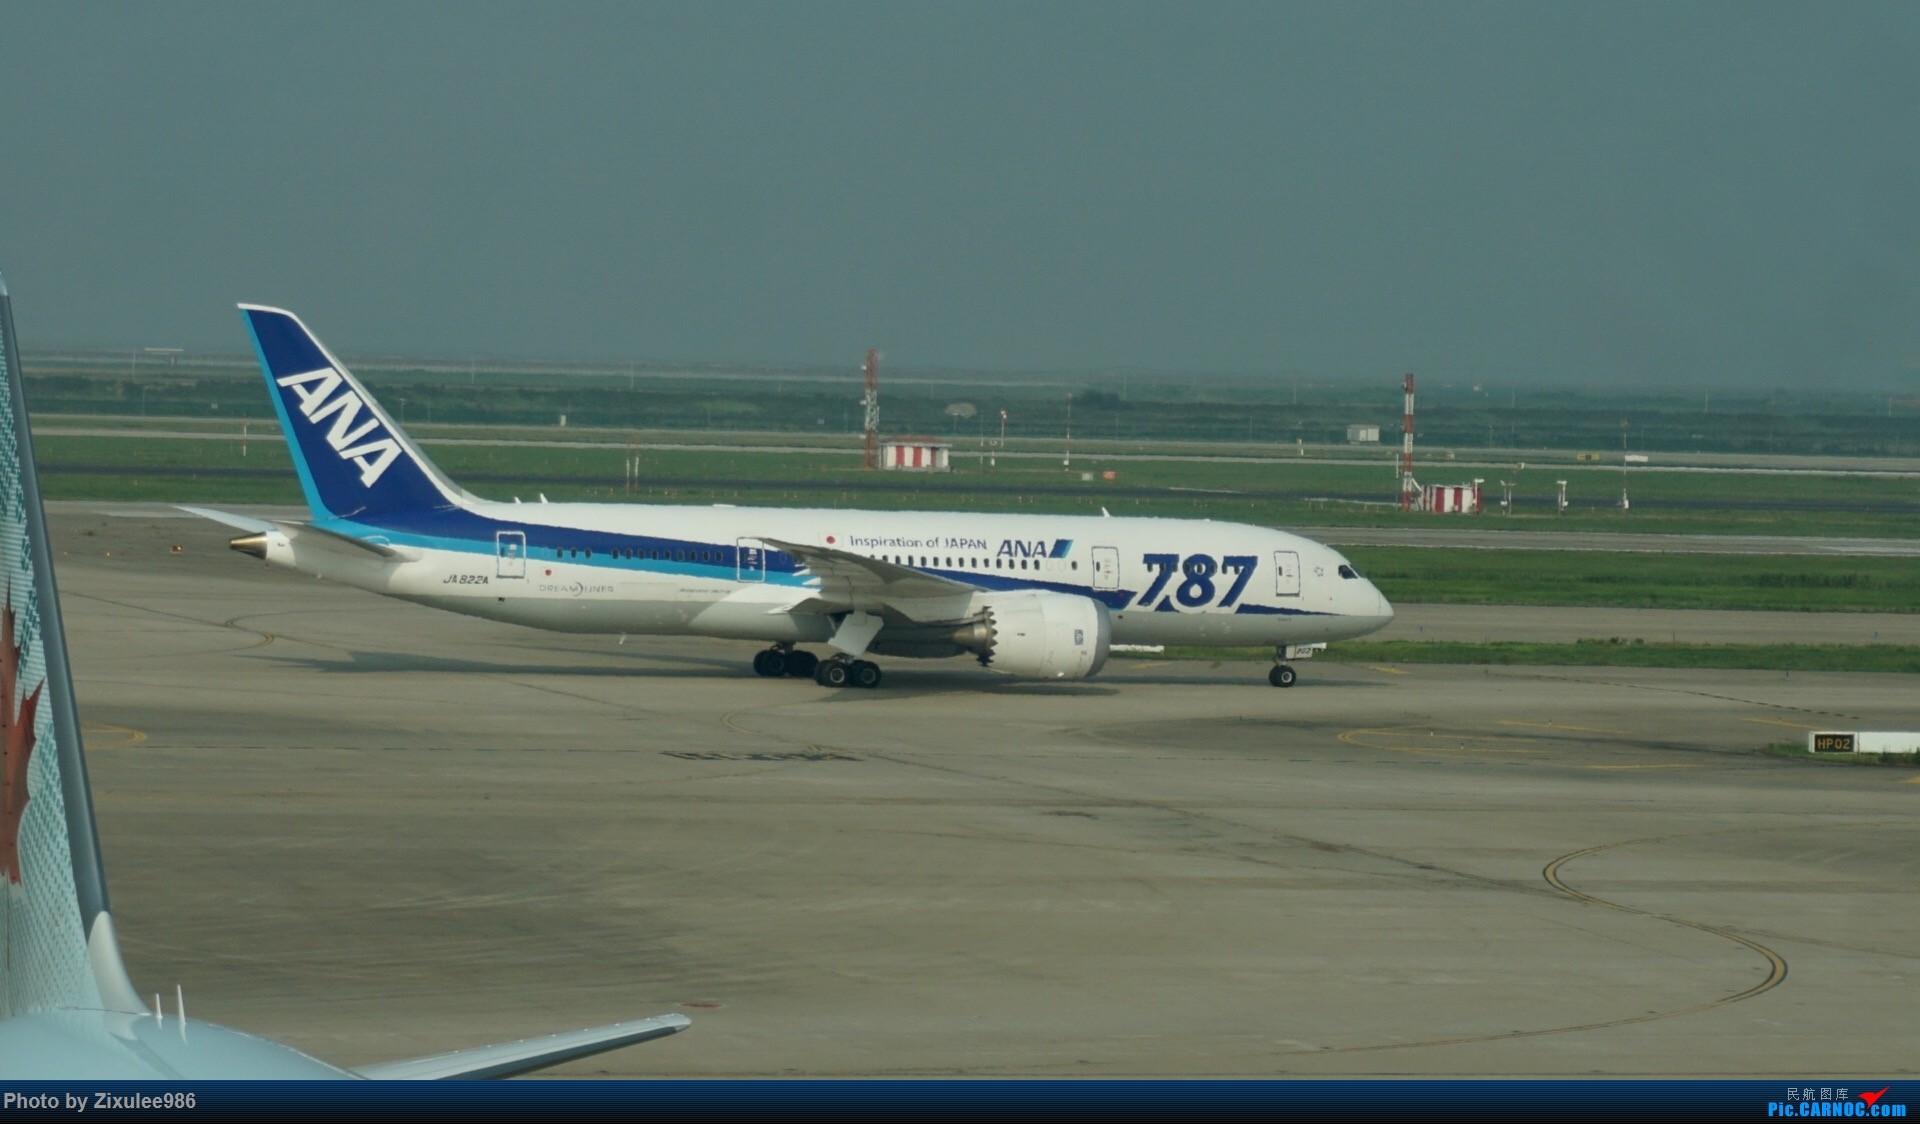 Re:[原创]加拿大21日游学之旅(一)~JJN-PVG-YYZ..(内含flightlog)~第一次发游记~多图缓更请谅解 BOEING 787-8 JA822A 中国上海浦东国际机场